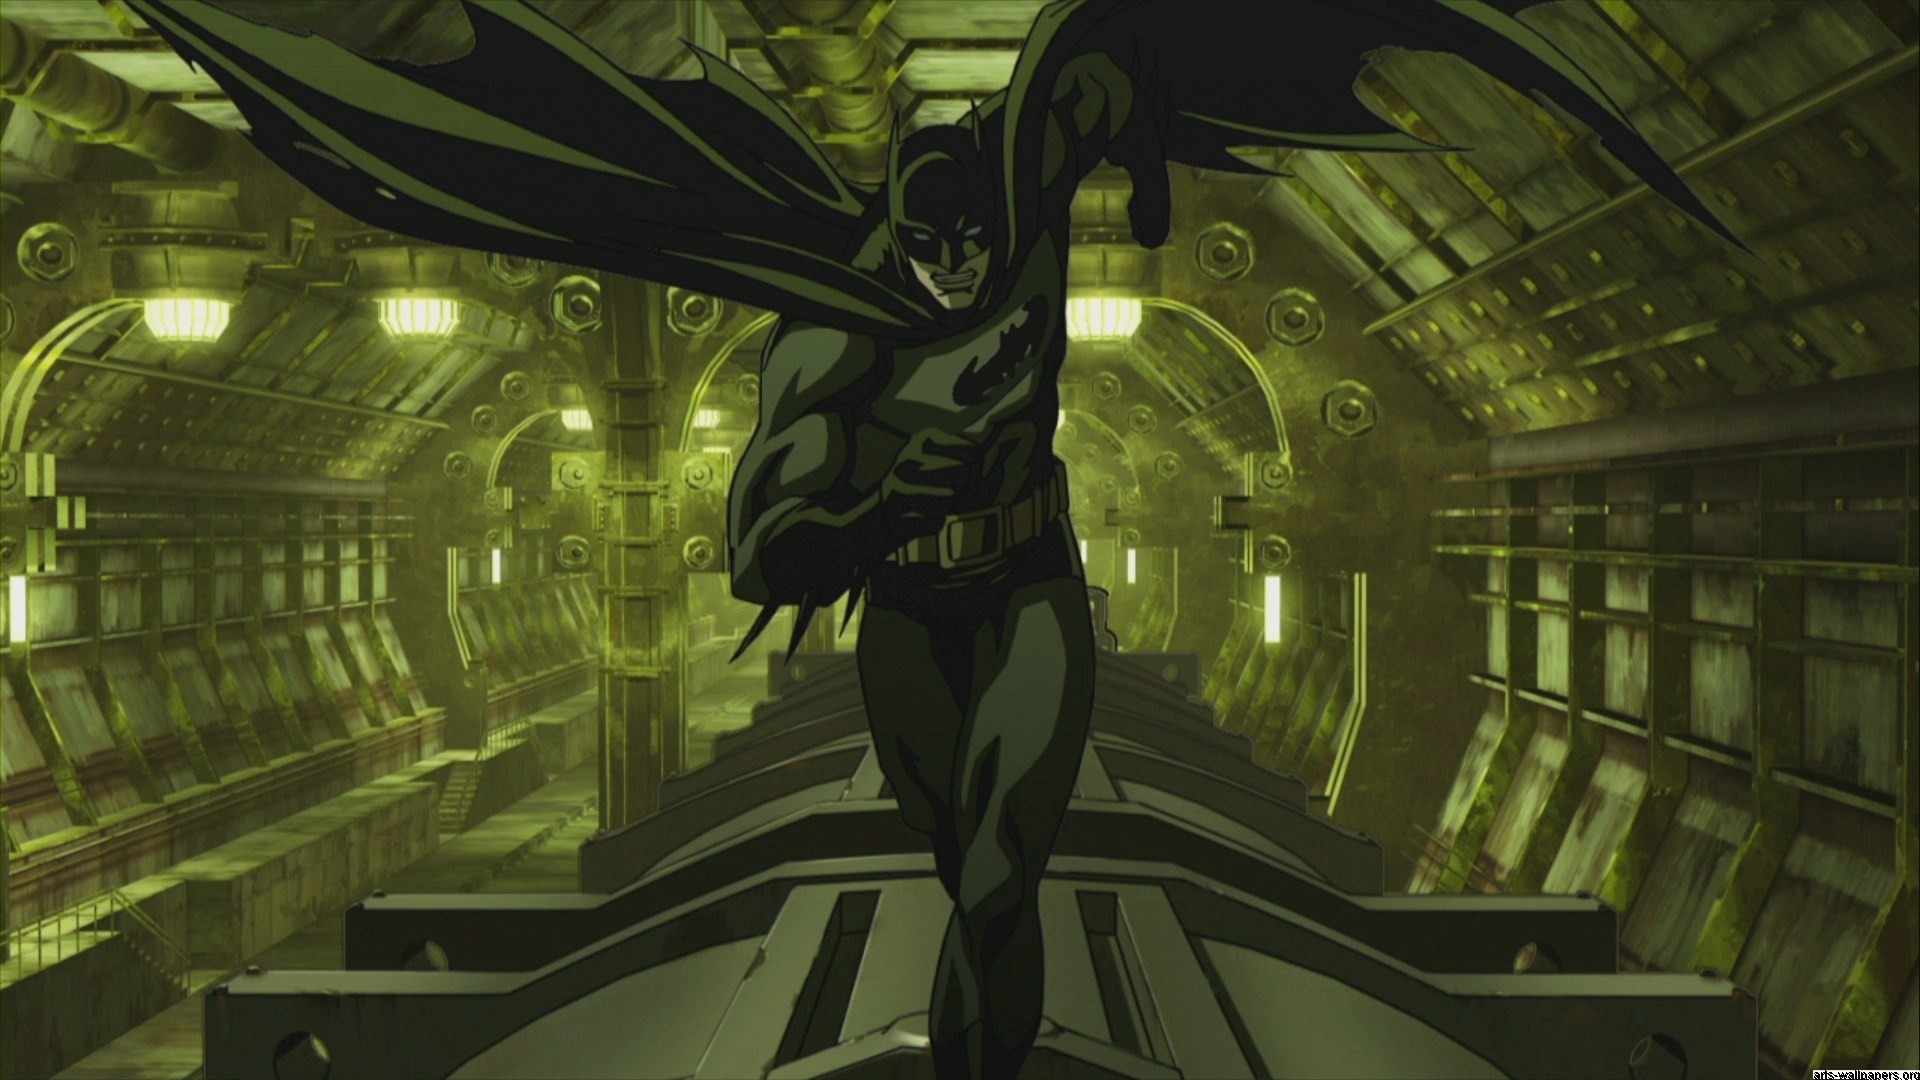 free screensaver wallpapers for batman gotham knight, Javon Thomas  2017-03-21